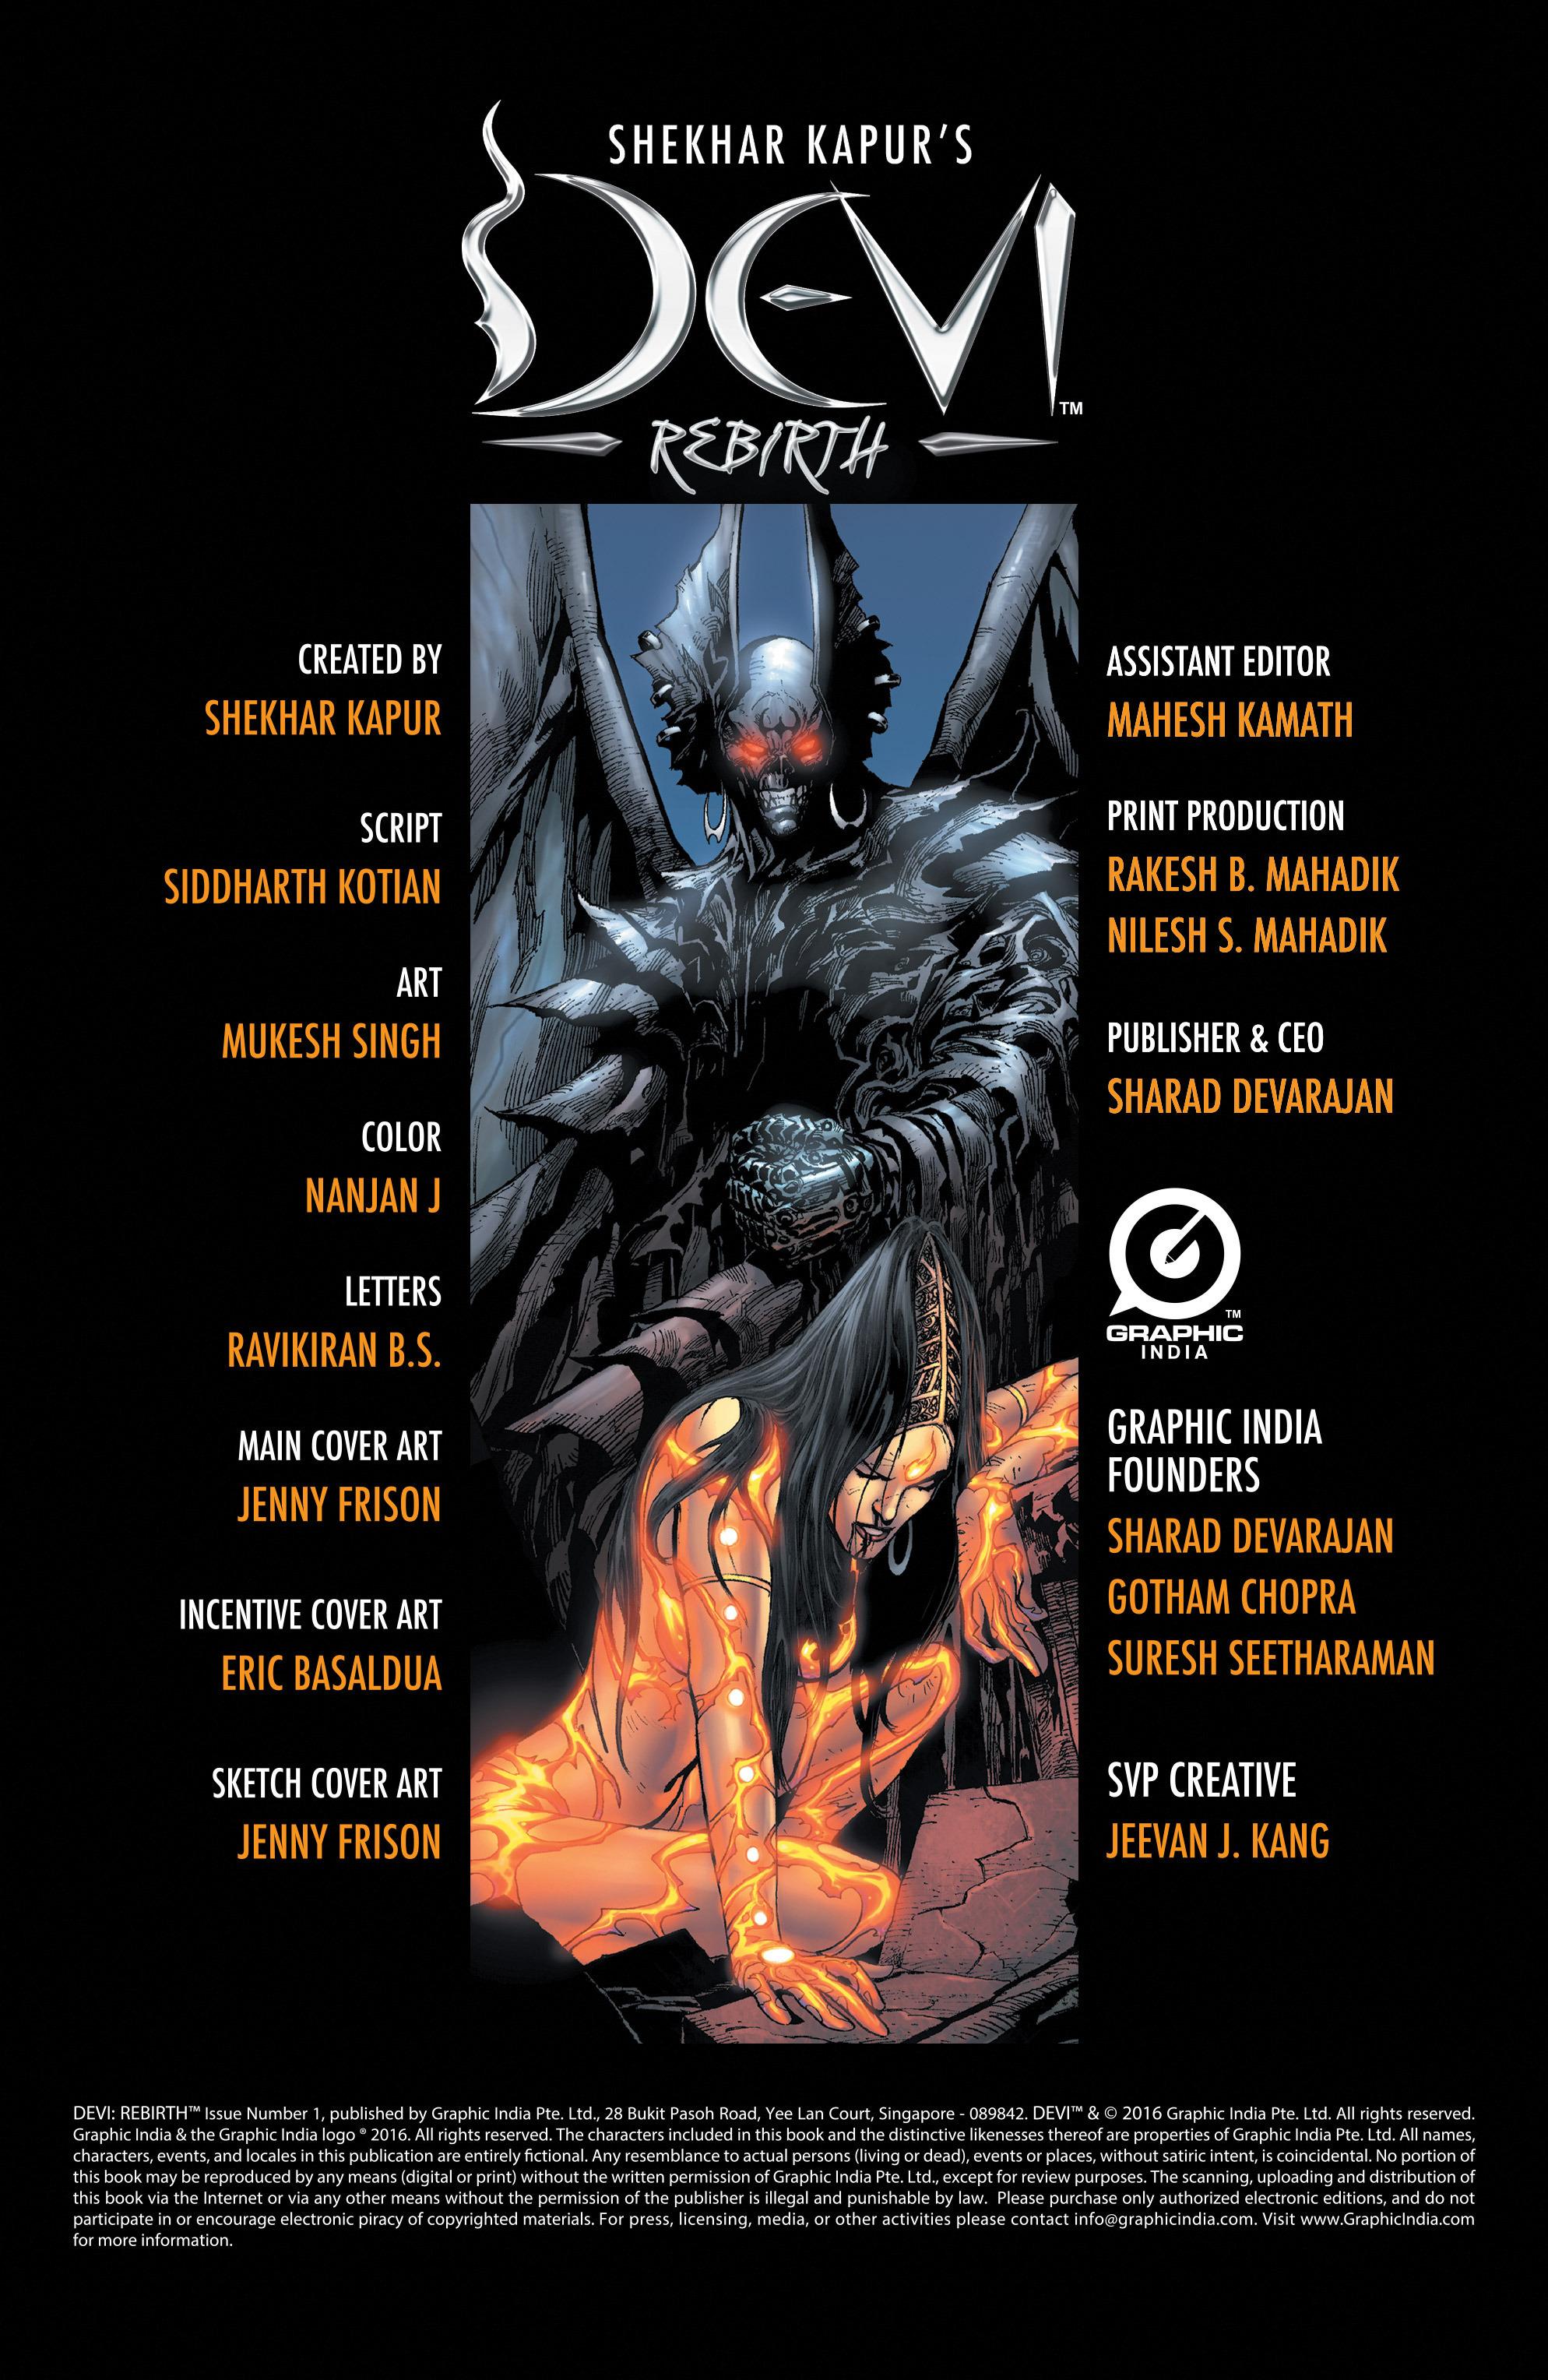 Read online Shekhar Kapur's Devi: Rebirth comic -  Issue #1 - 2